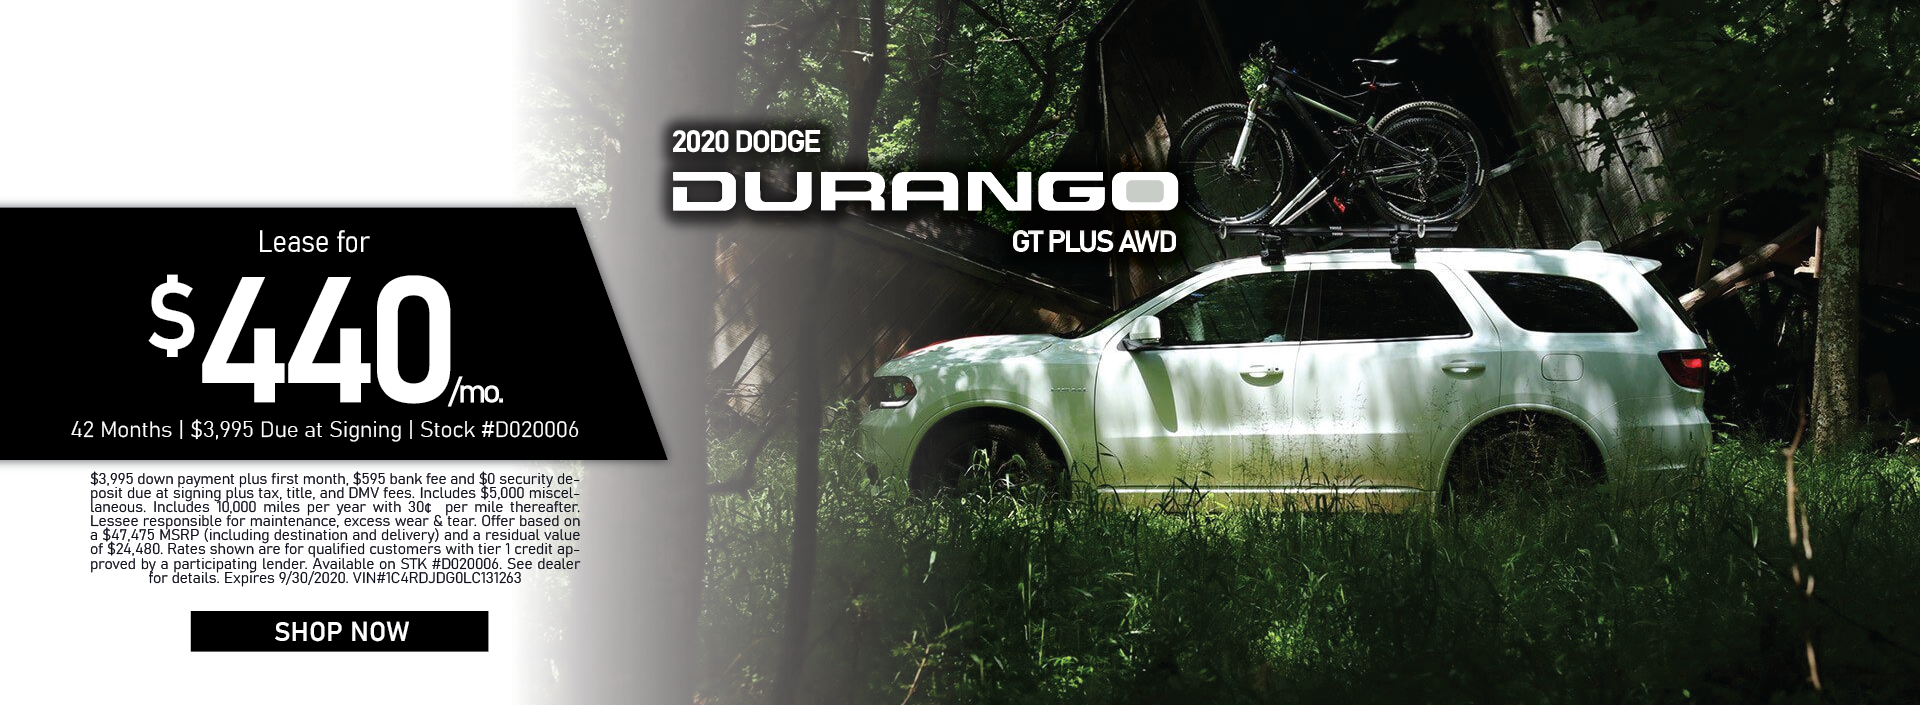 Durango-SEPT2020